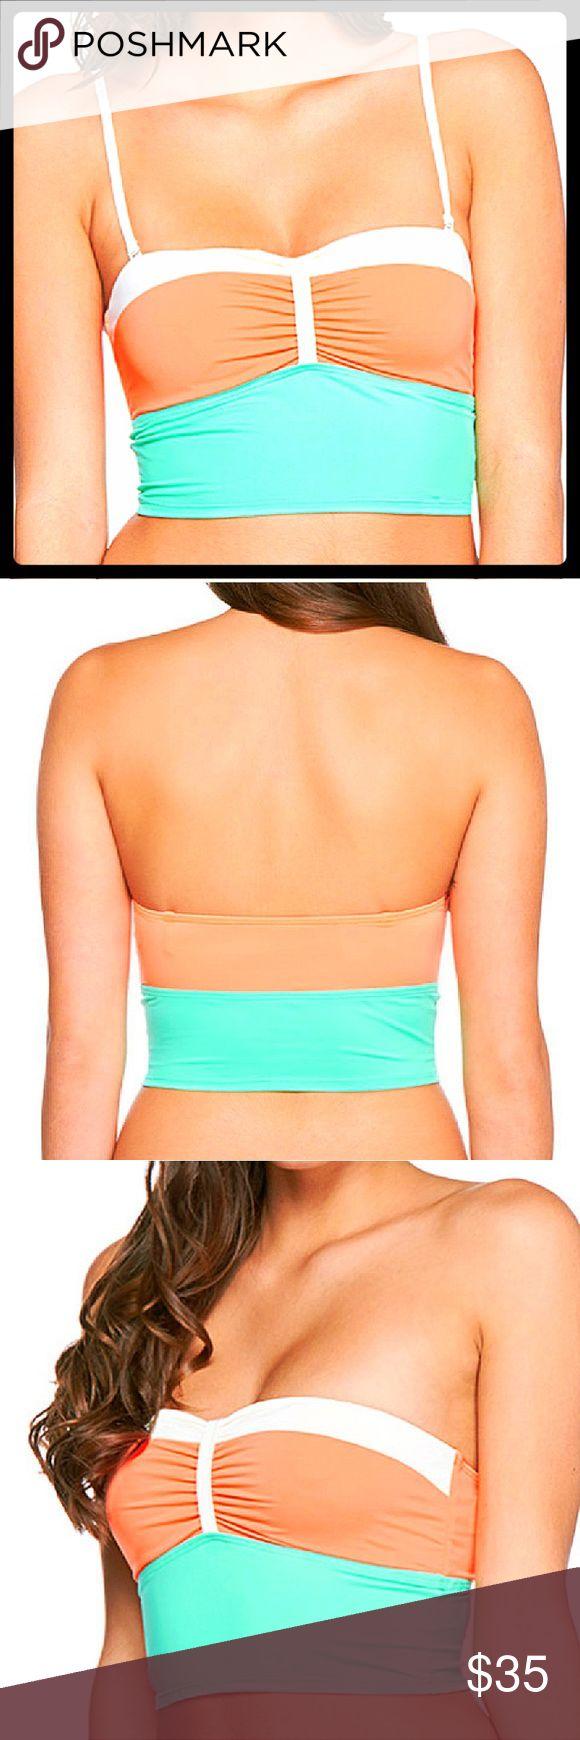 NWOT MINT GREEN & ORANGE SWIM TOP NEW WITHOUT TAG. PRETTY MINT GREEN & ORANGE BANDEAU TOP WITH ADJUSTABLE & REMOVABLE STRAPS. Eidon Swim Bikinis